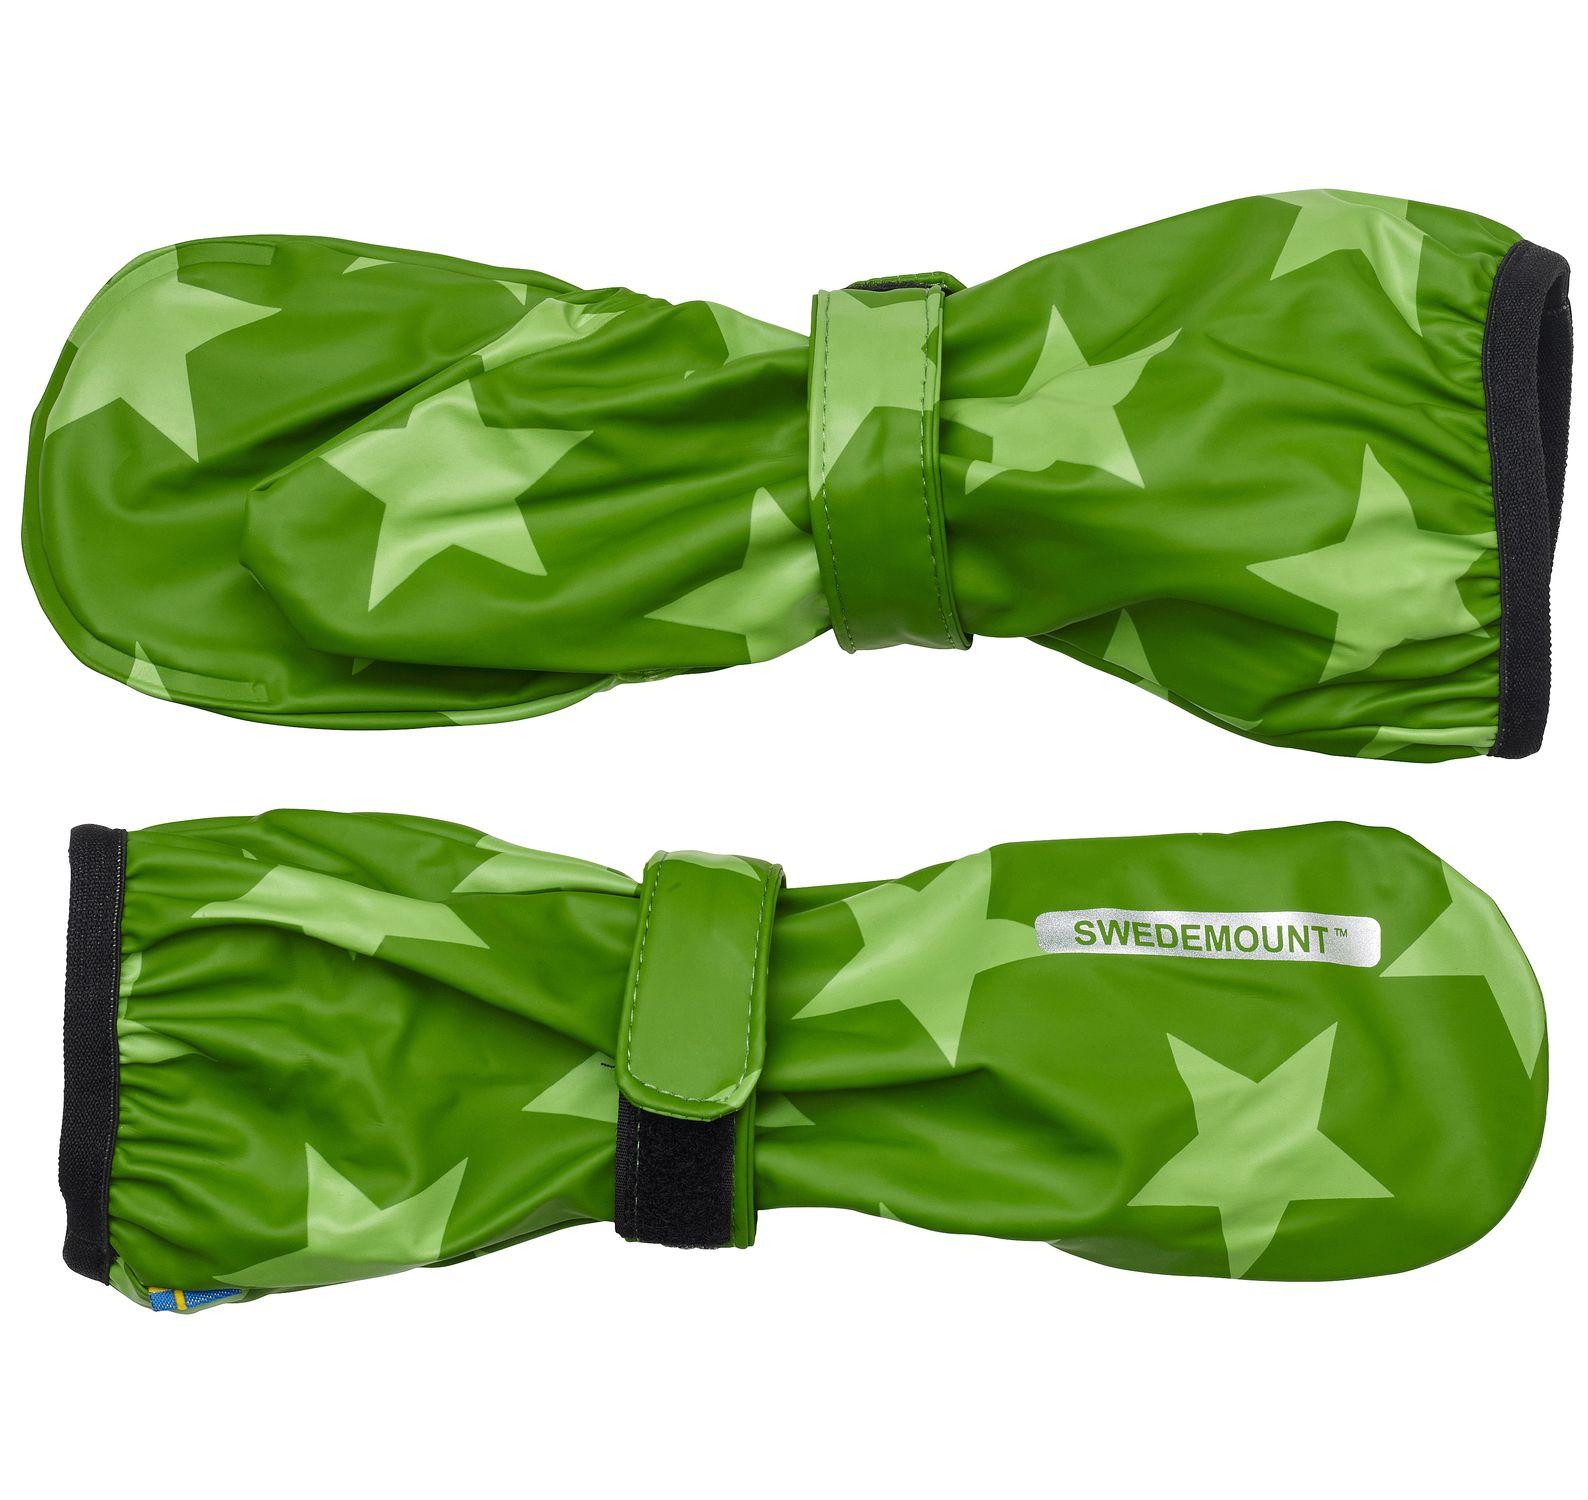 Dropp Rainglove, Dk Green/Lt Green, 6-8y, Regnkläder